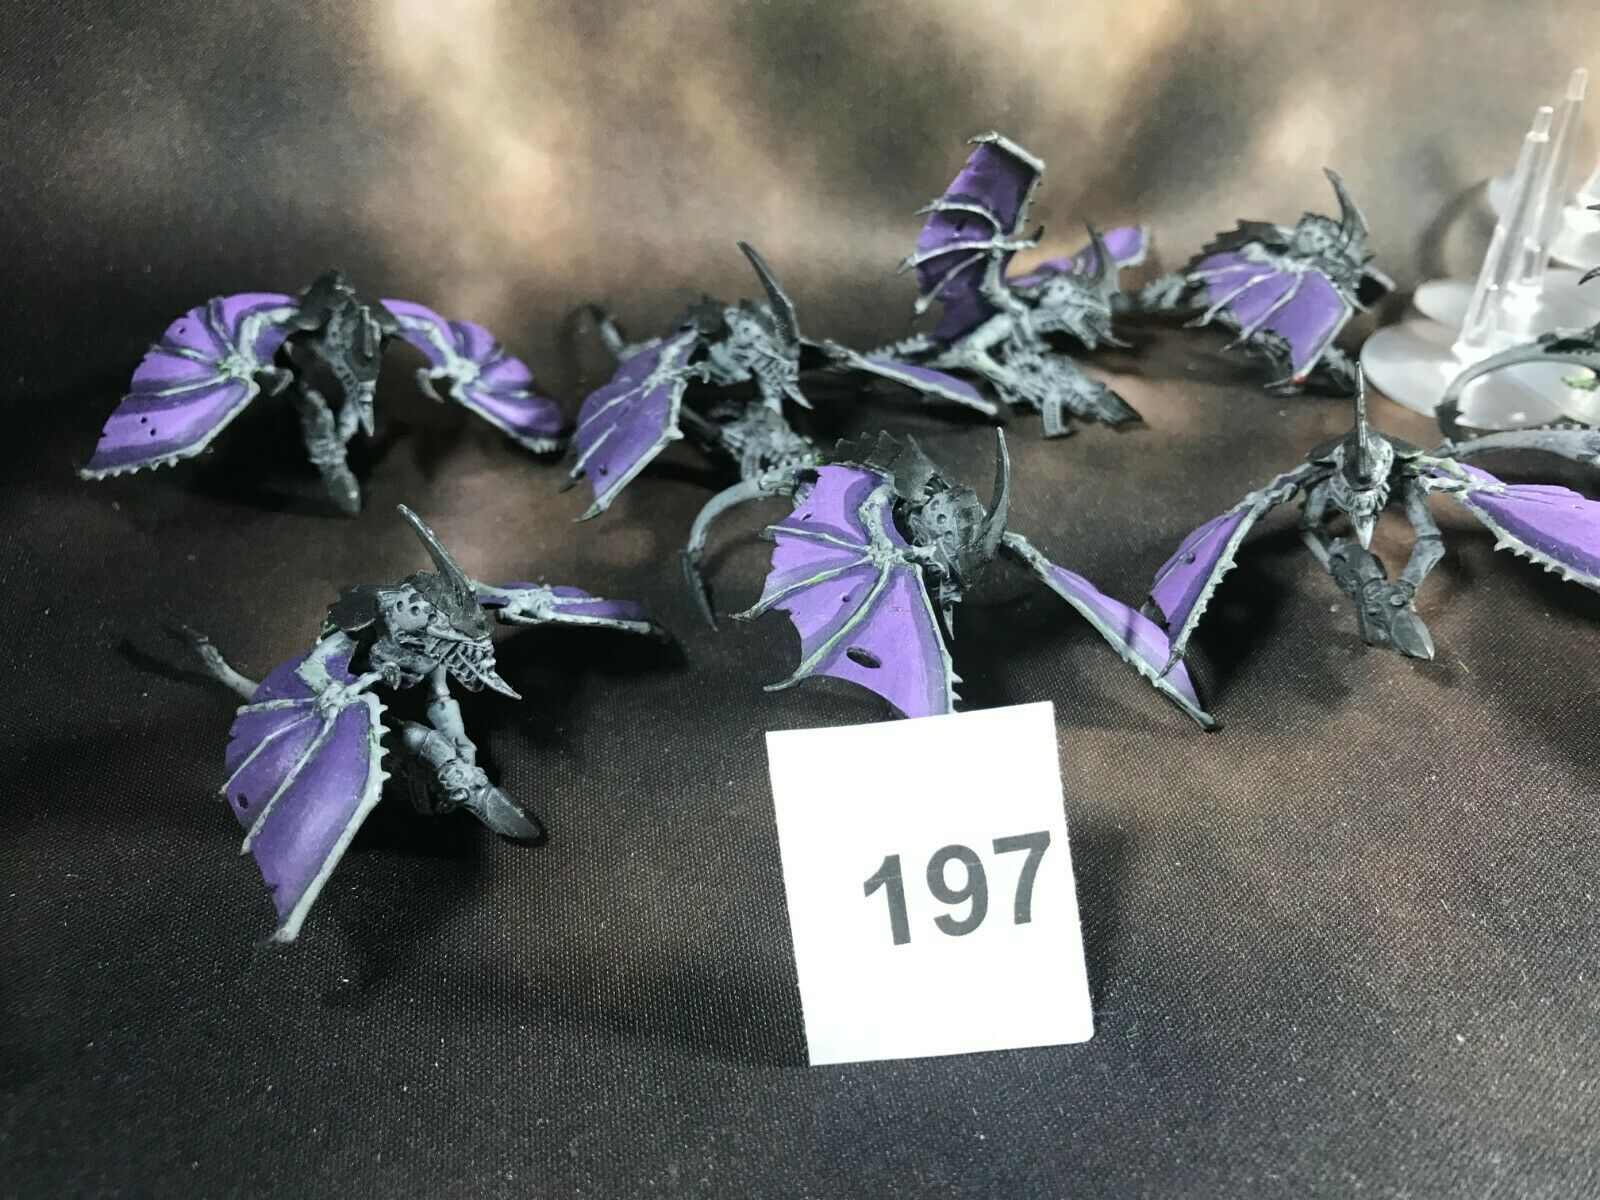 Warhammer 40k Tyranids Genestealer Cult Gargoyles Painted